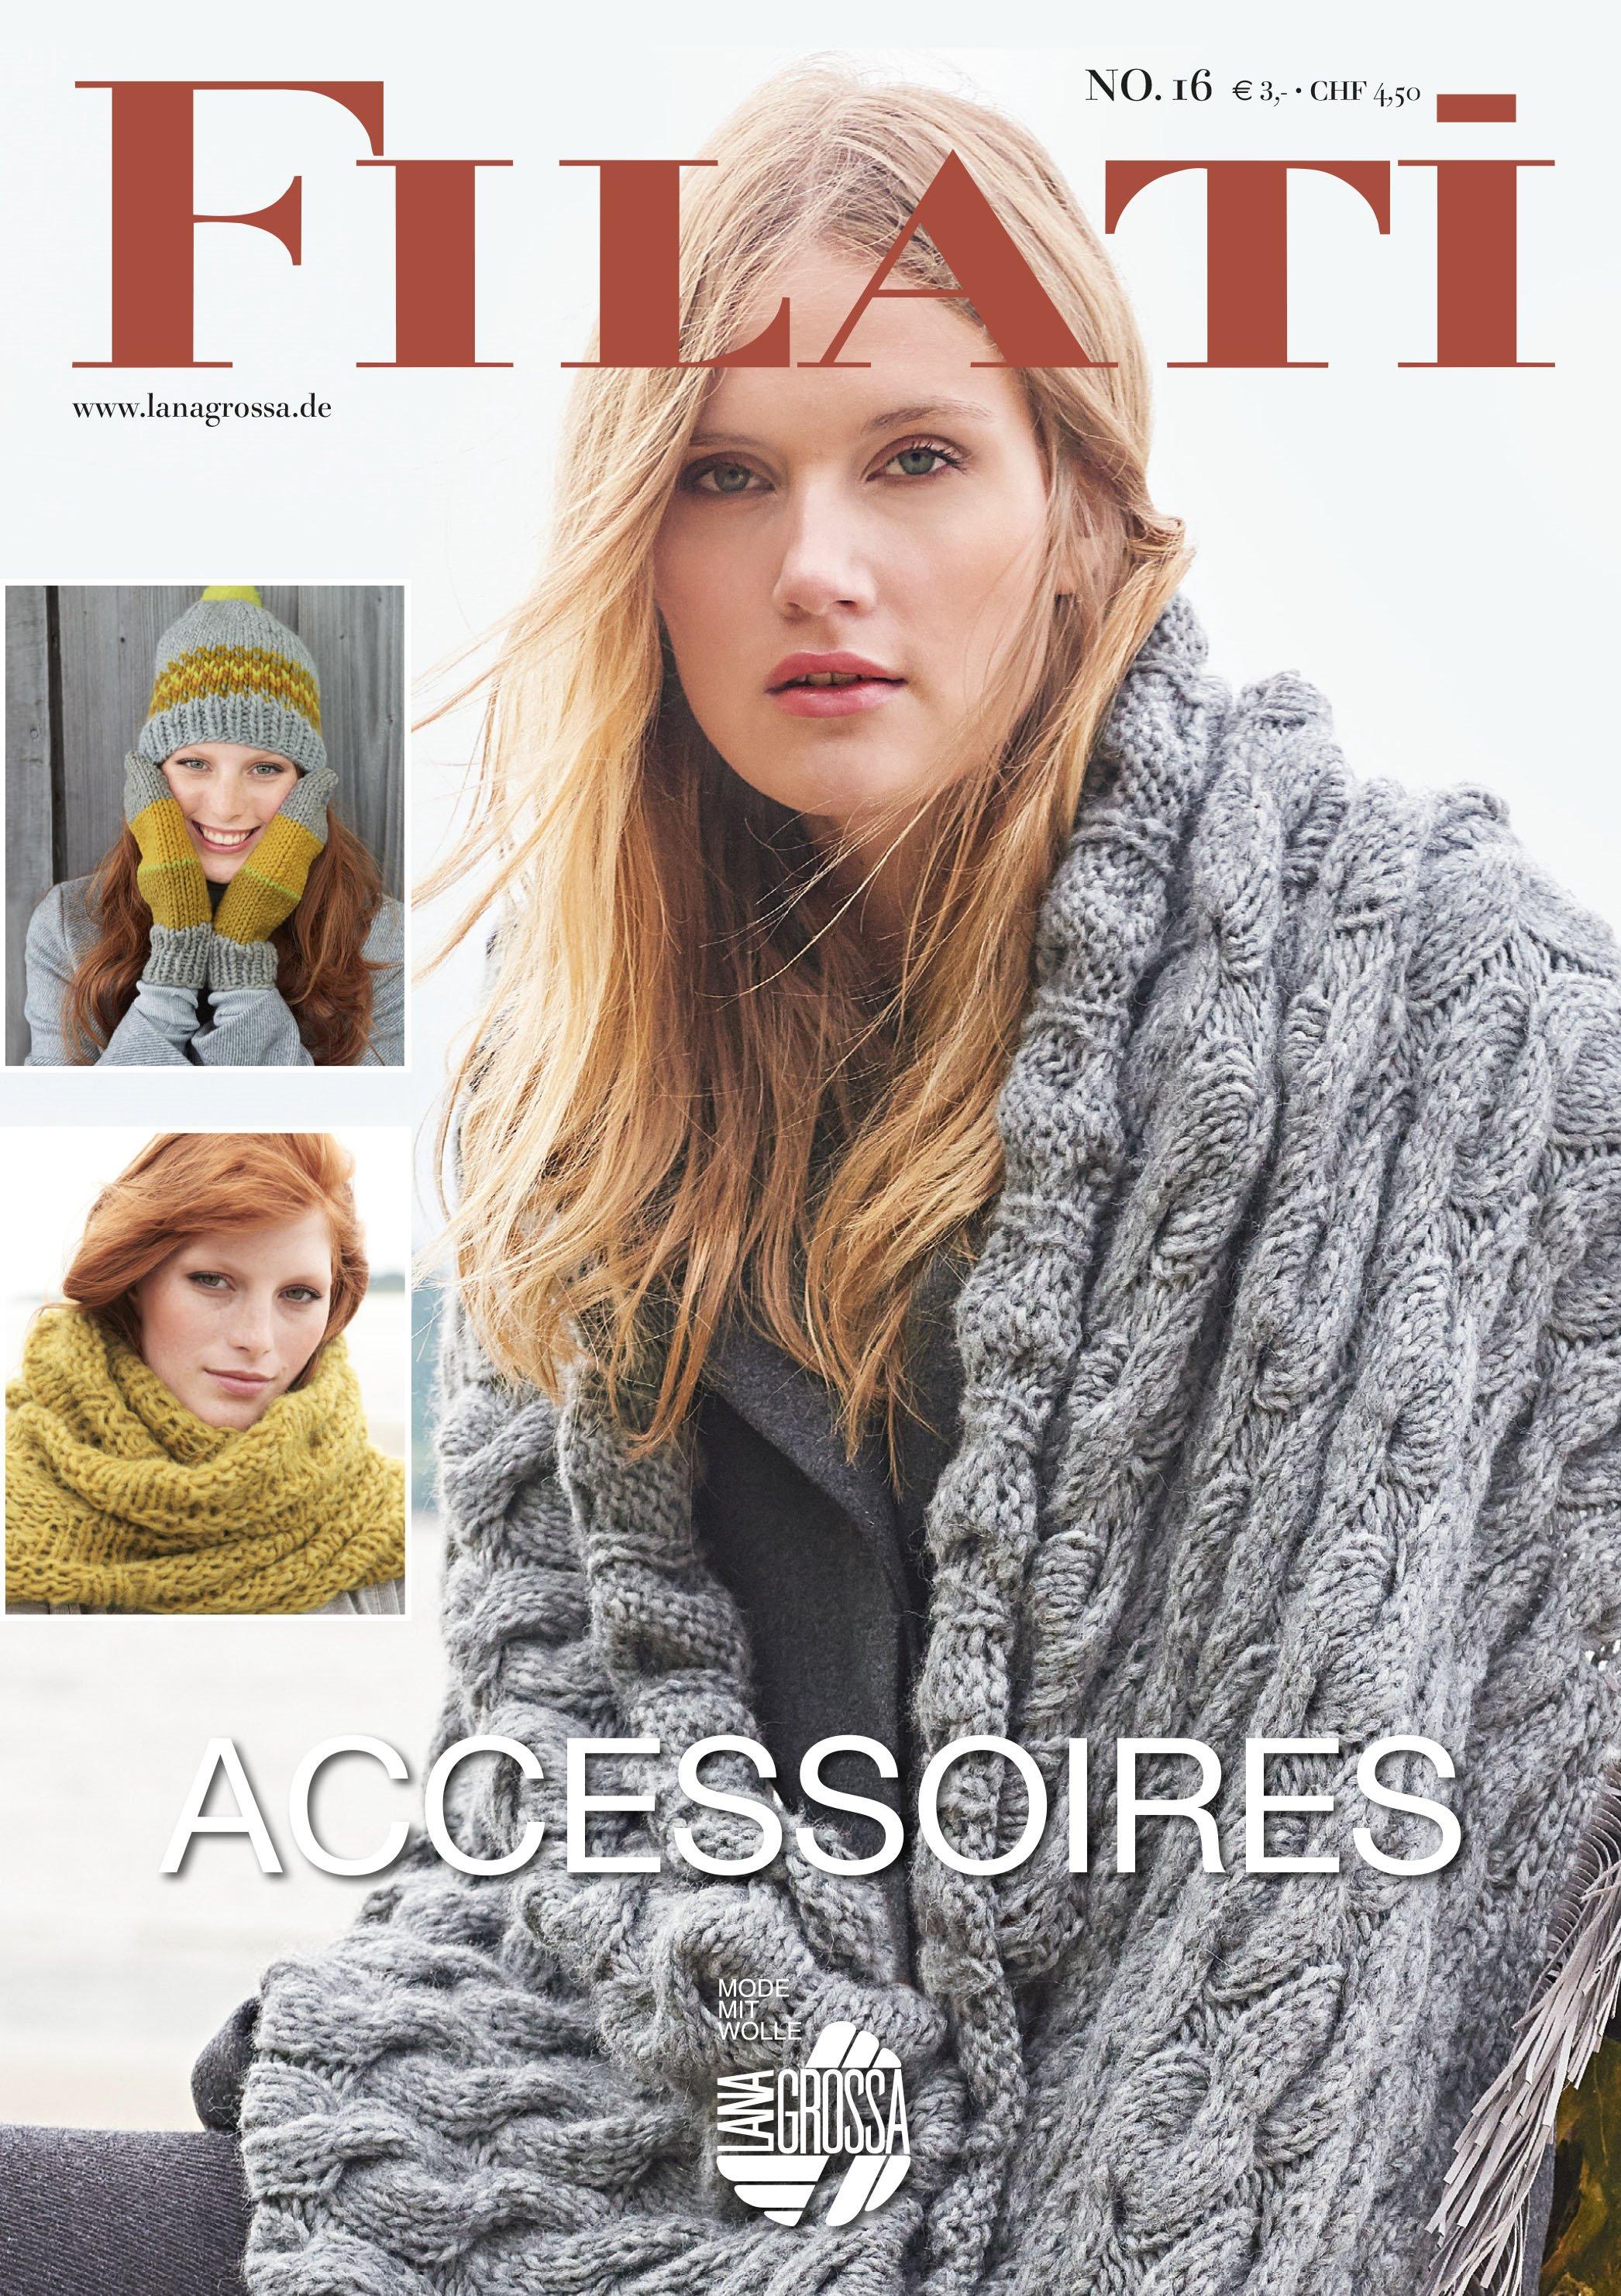 Lana Grossa FILATI Accessoires No. 16 - German Edition